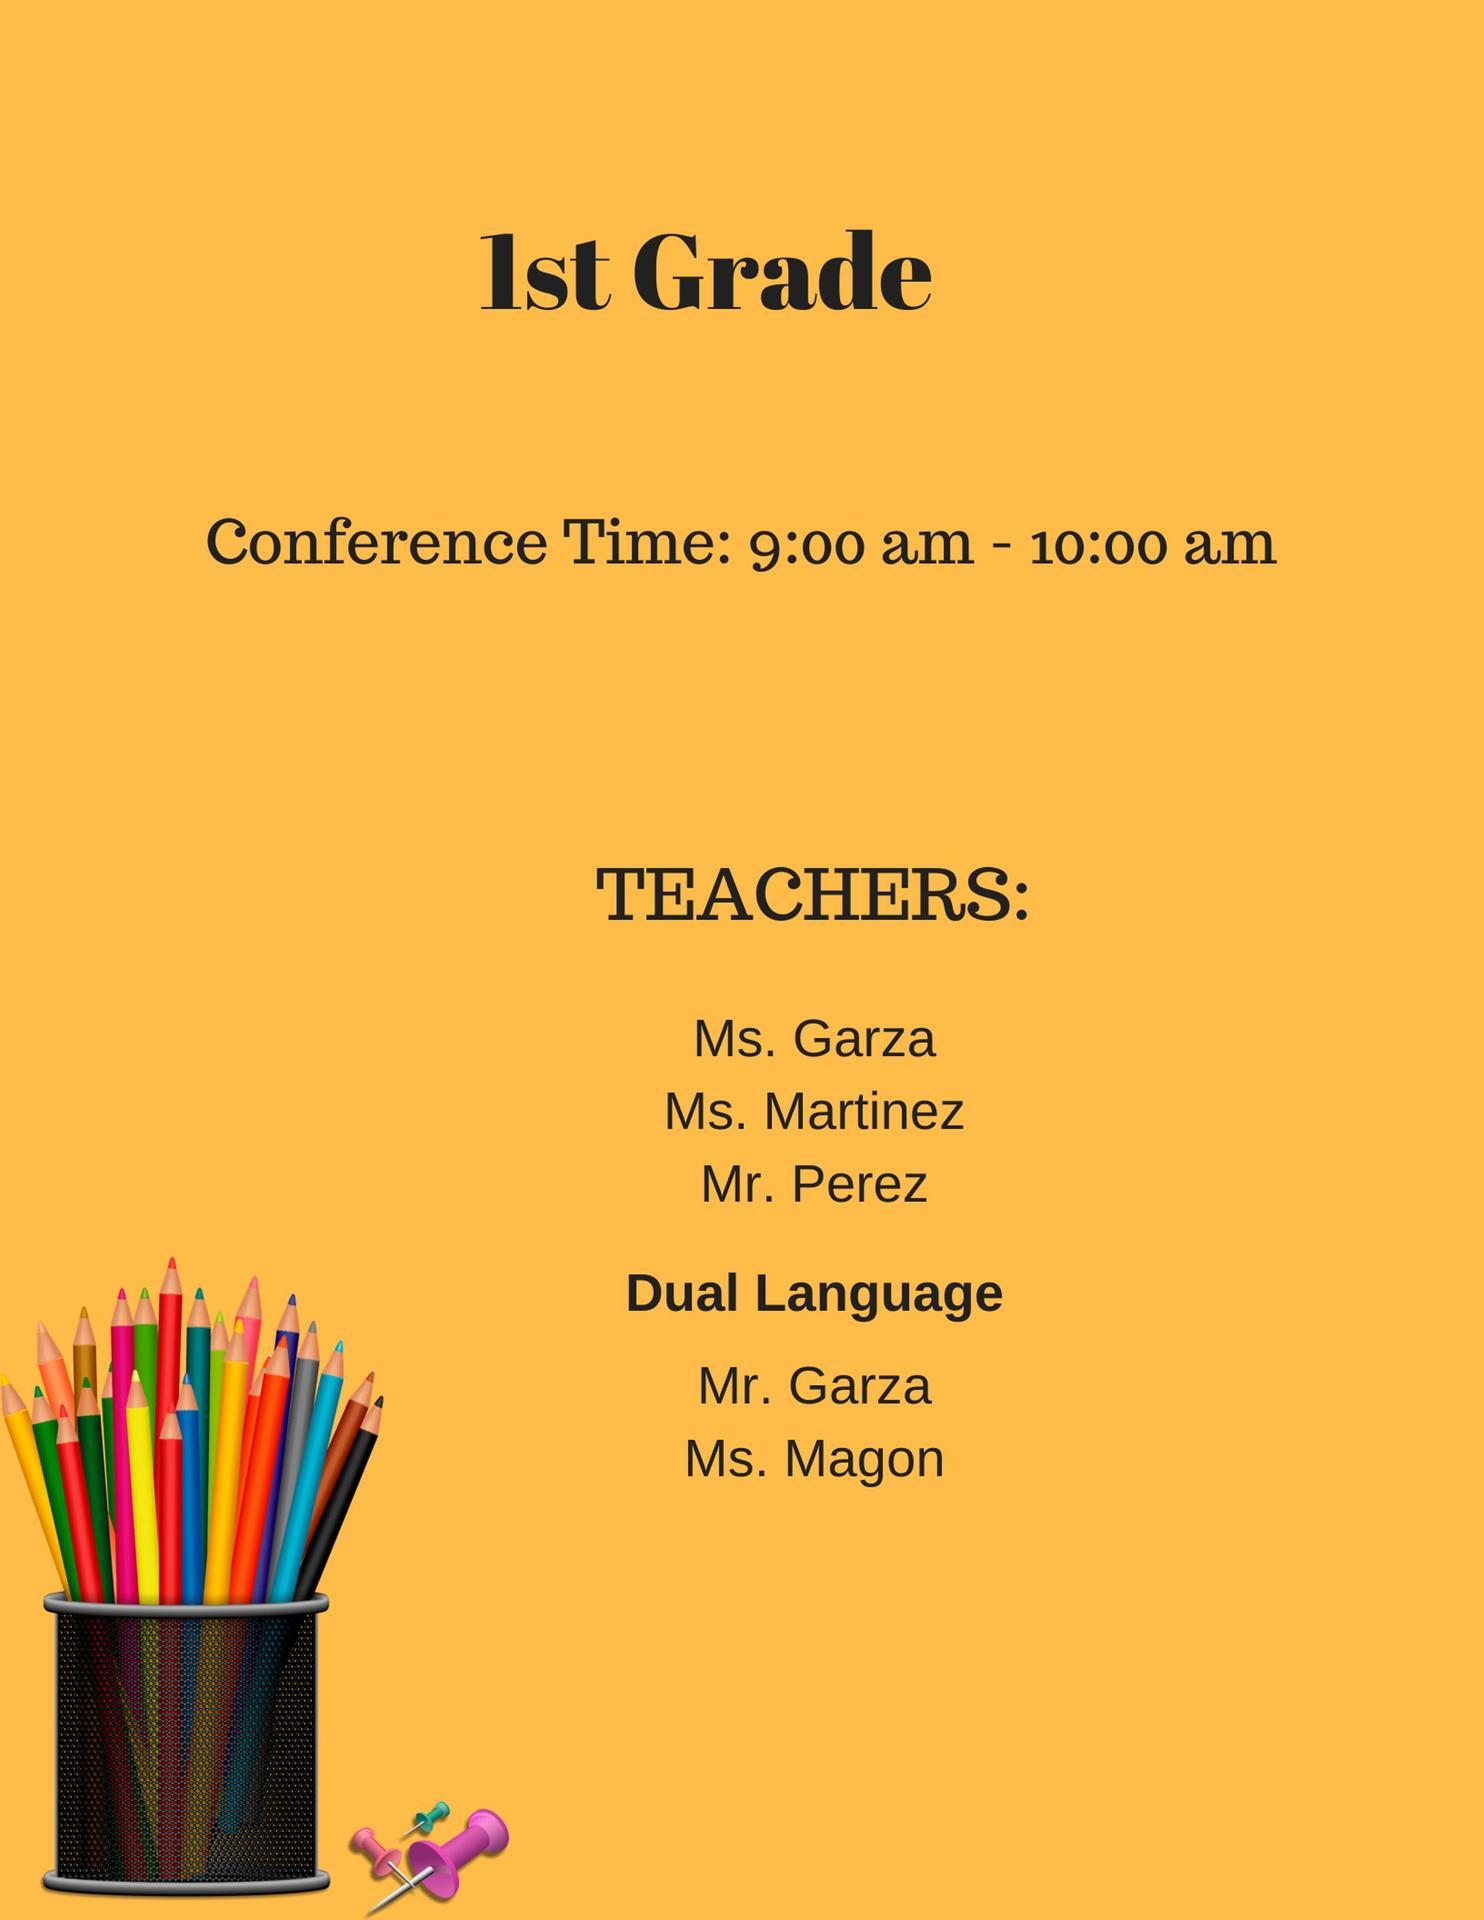 1st grade landing page